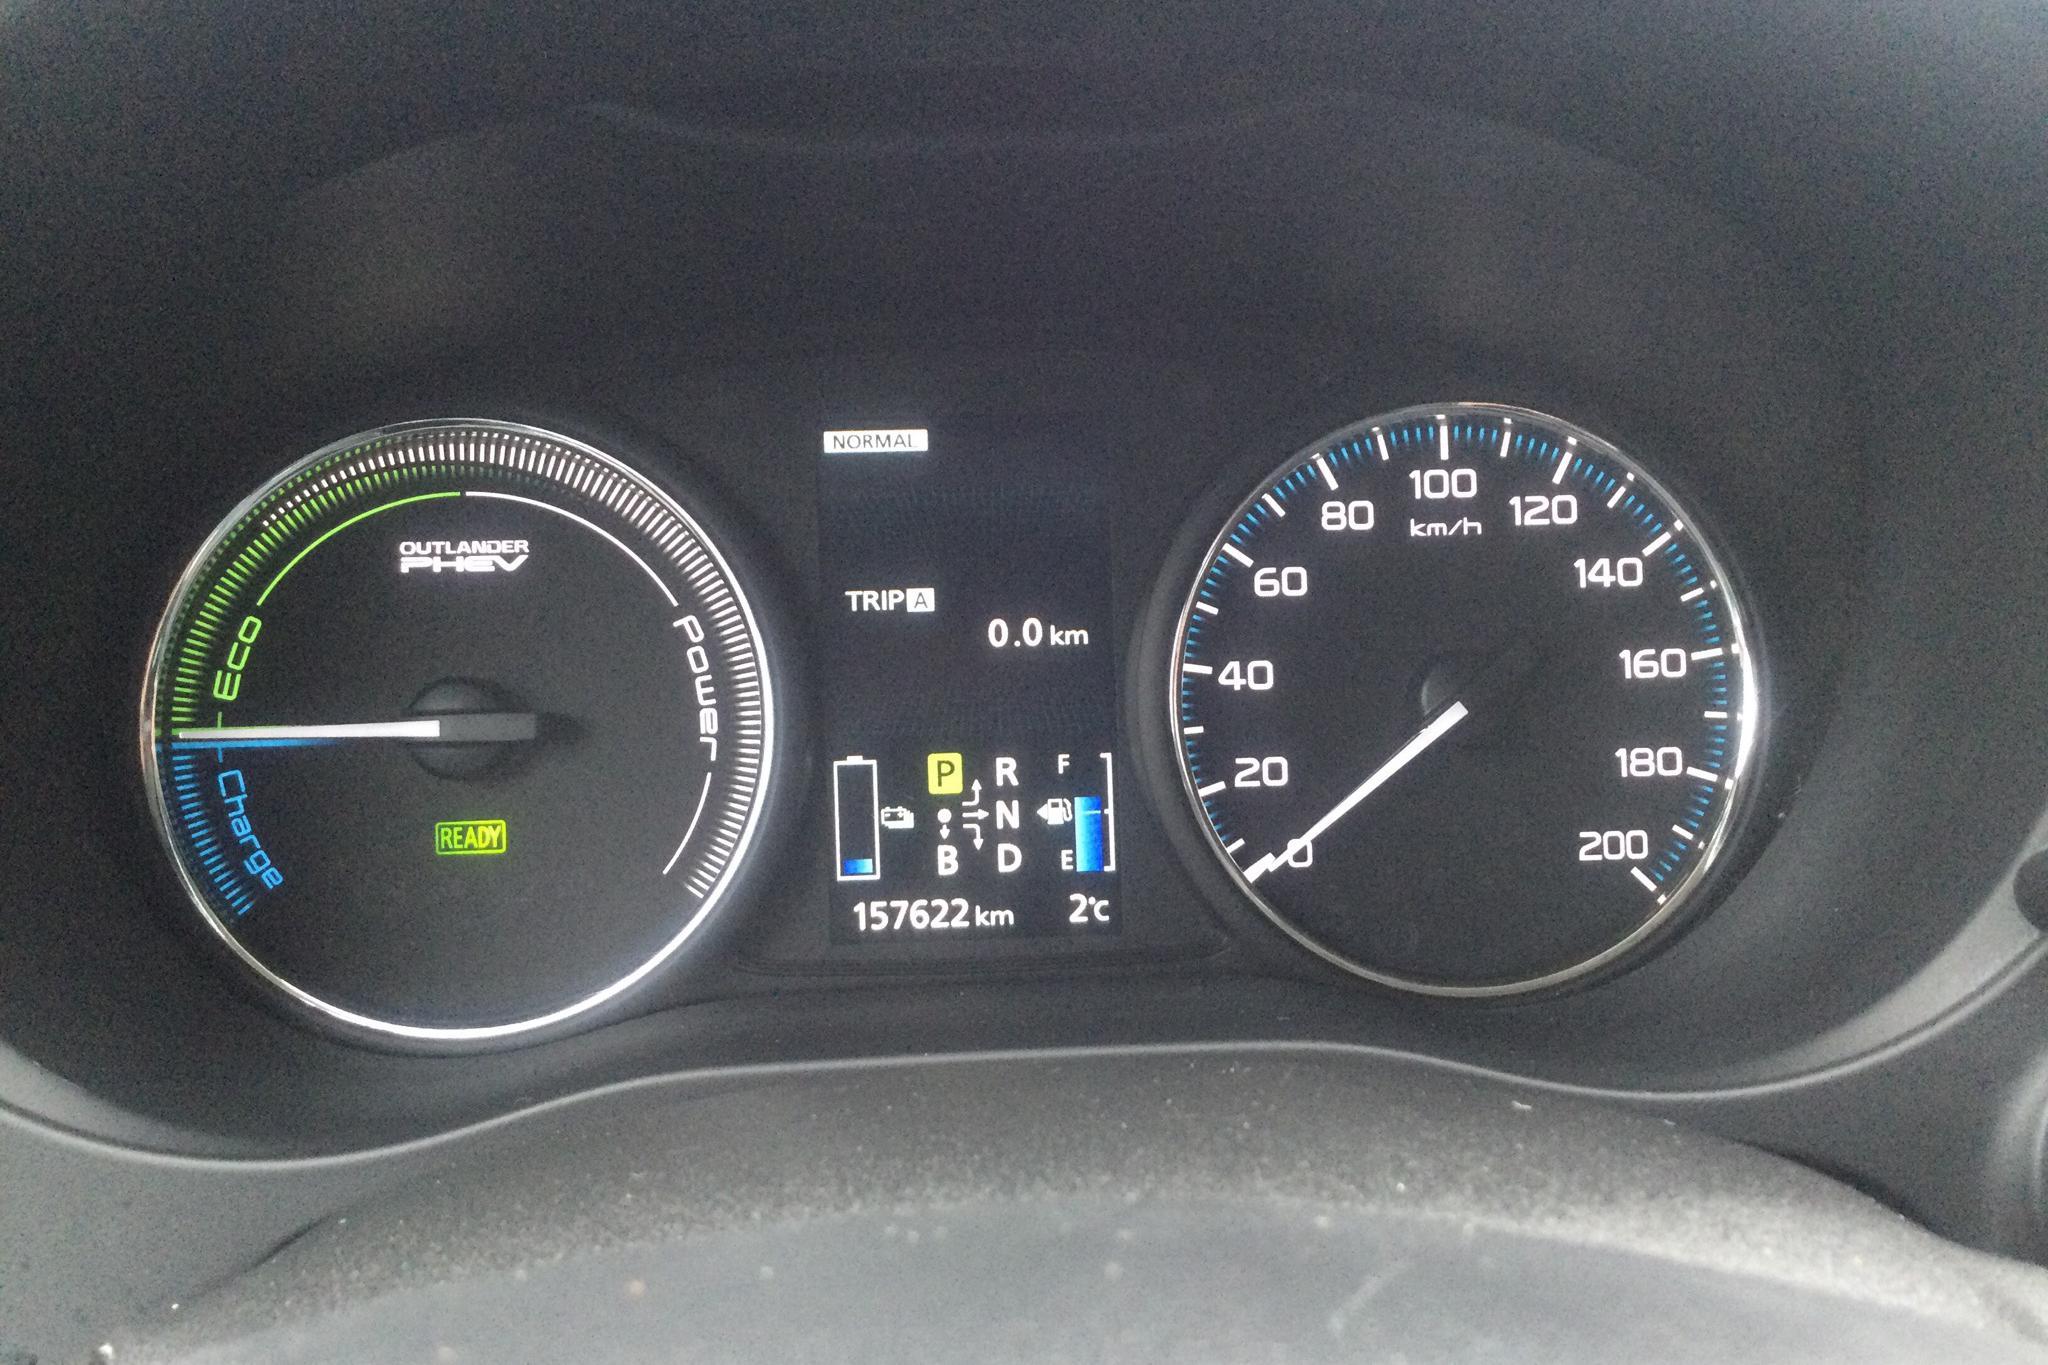 Mitsubishi Outlander 2.0 Plug-in Hybrid 4WD (121hk) - 15 762 mil - Automat - vit - 2015